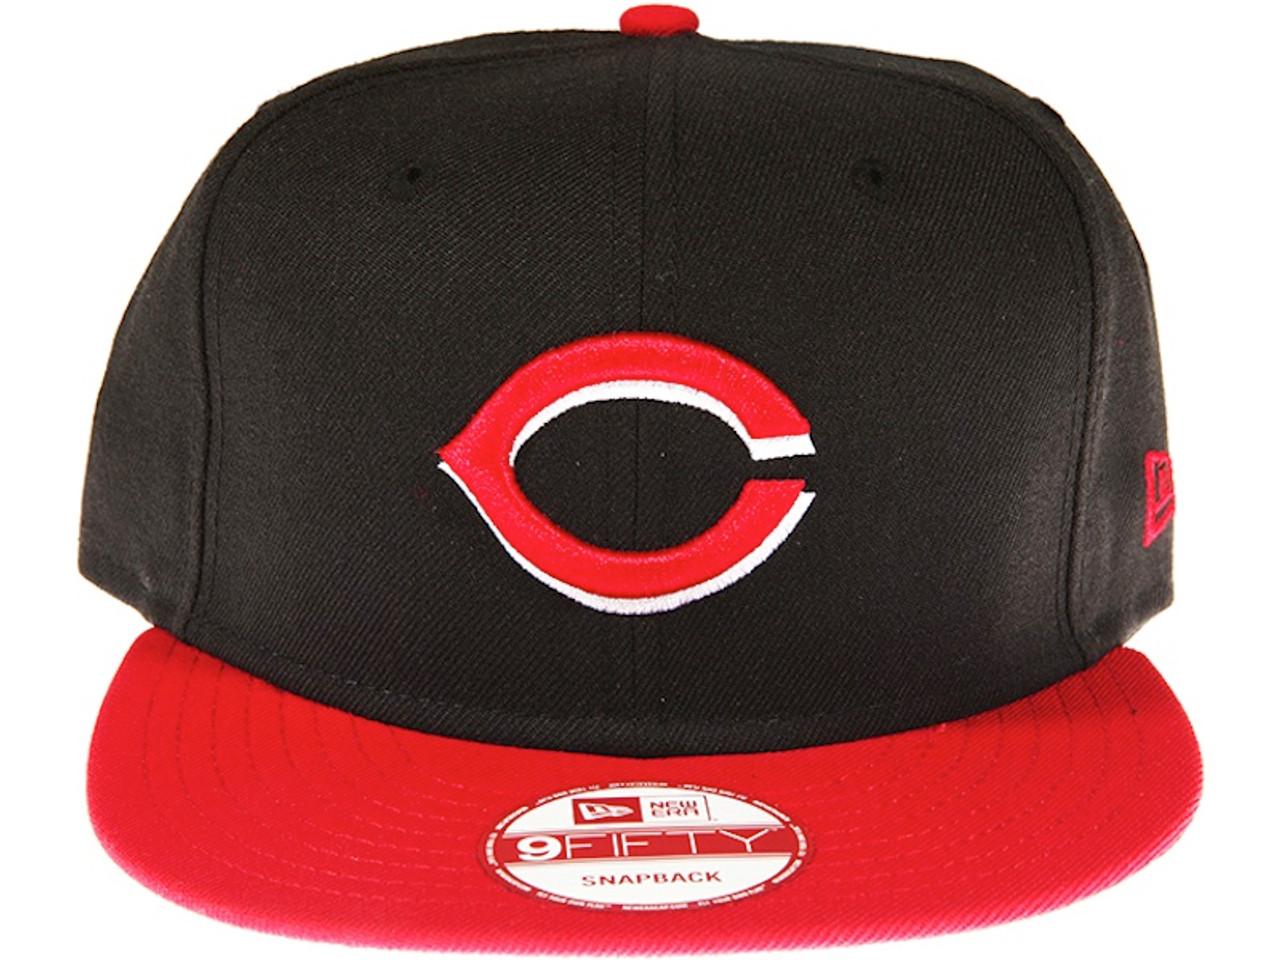 9bab907feea Cincinnati Reds 2-Tone Black and Red New Era 9FIFTY MLB Snapback Hat